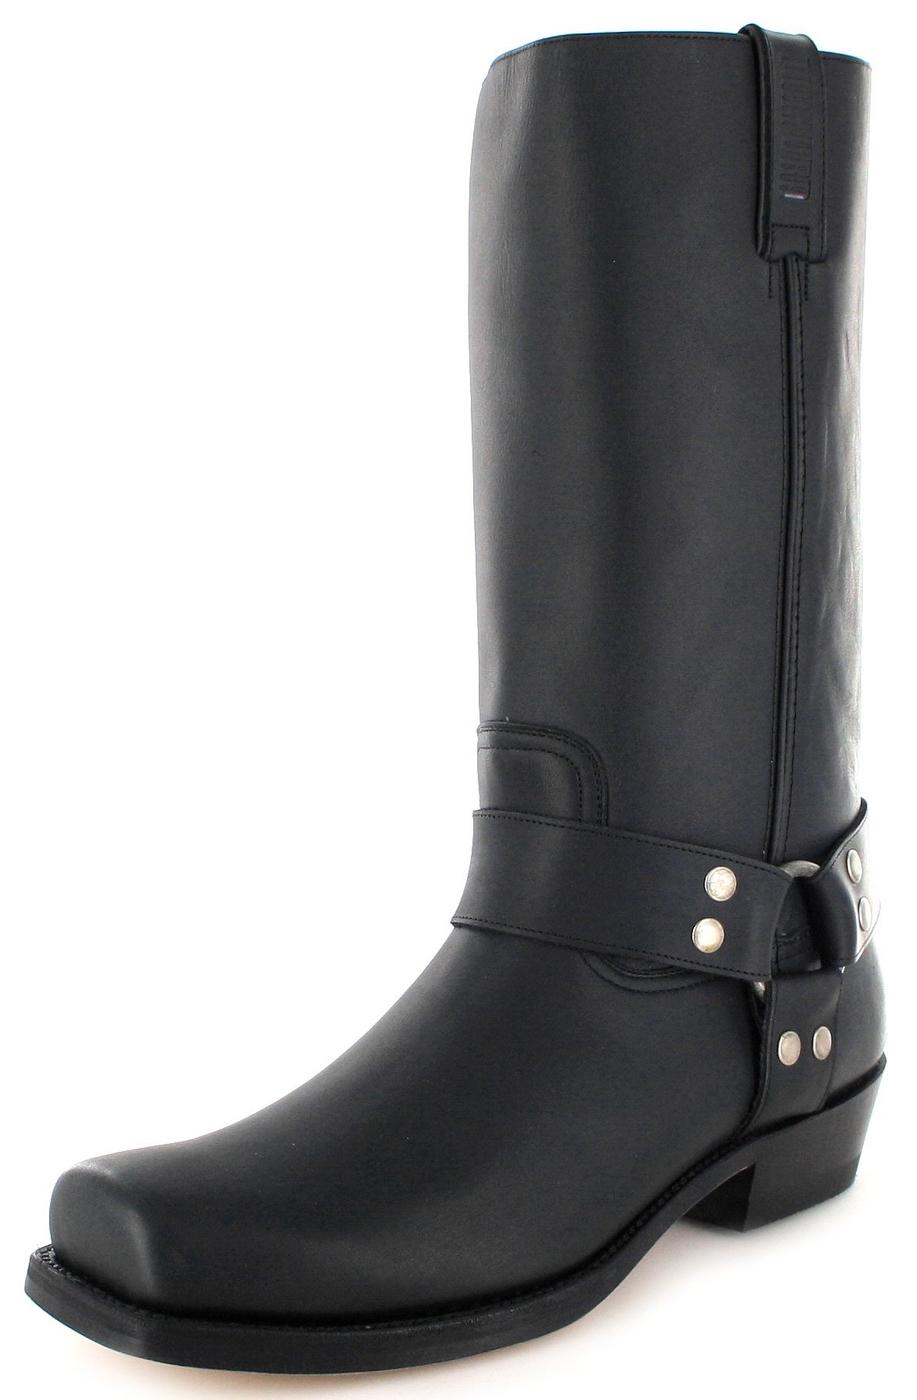 Mayura Boots MB001 Negro biker boot - black